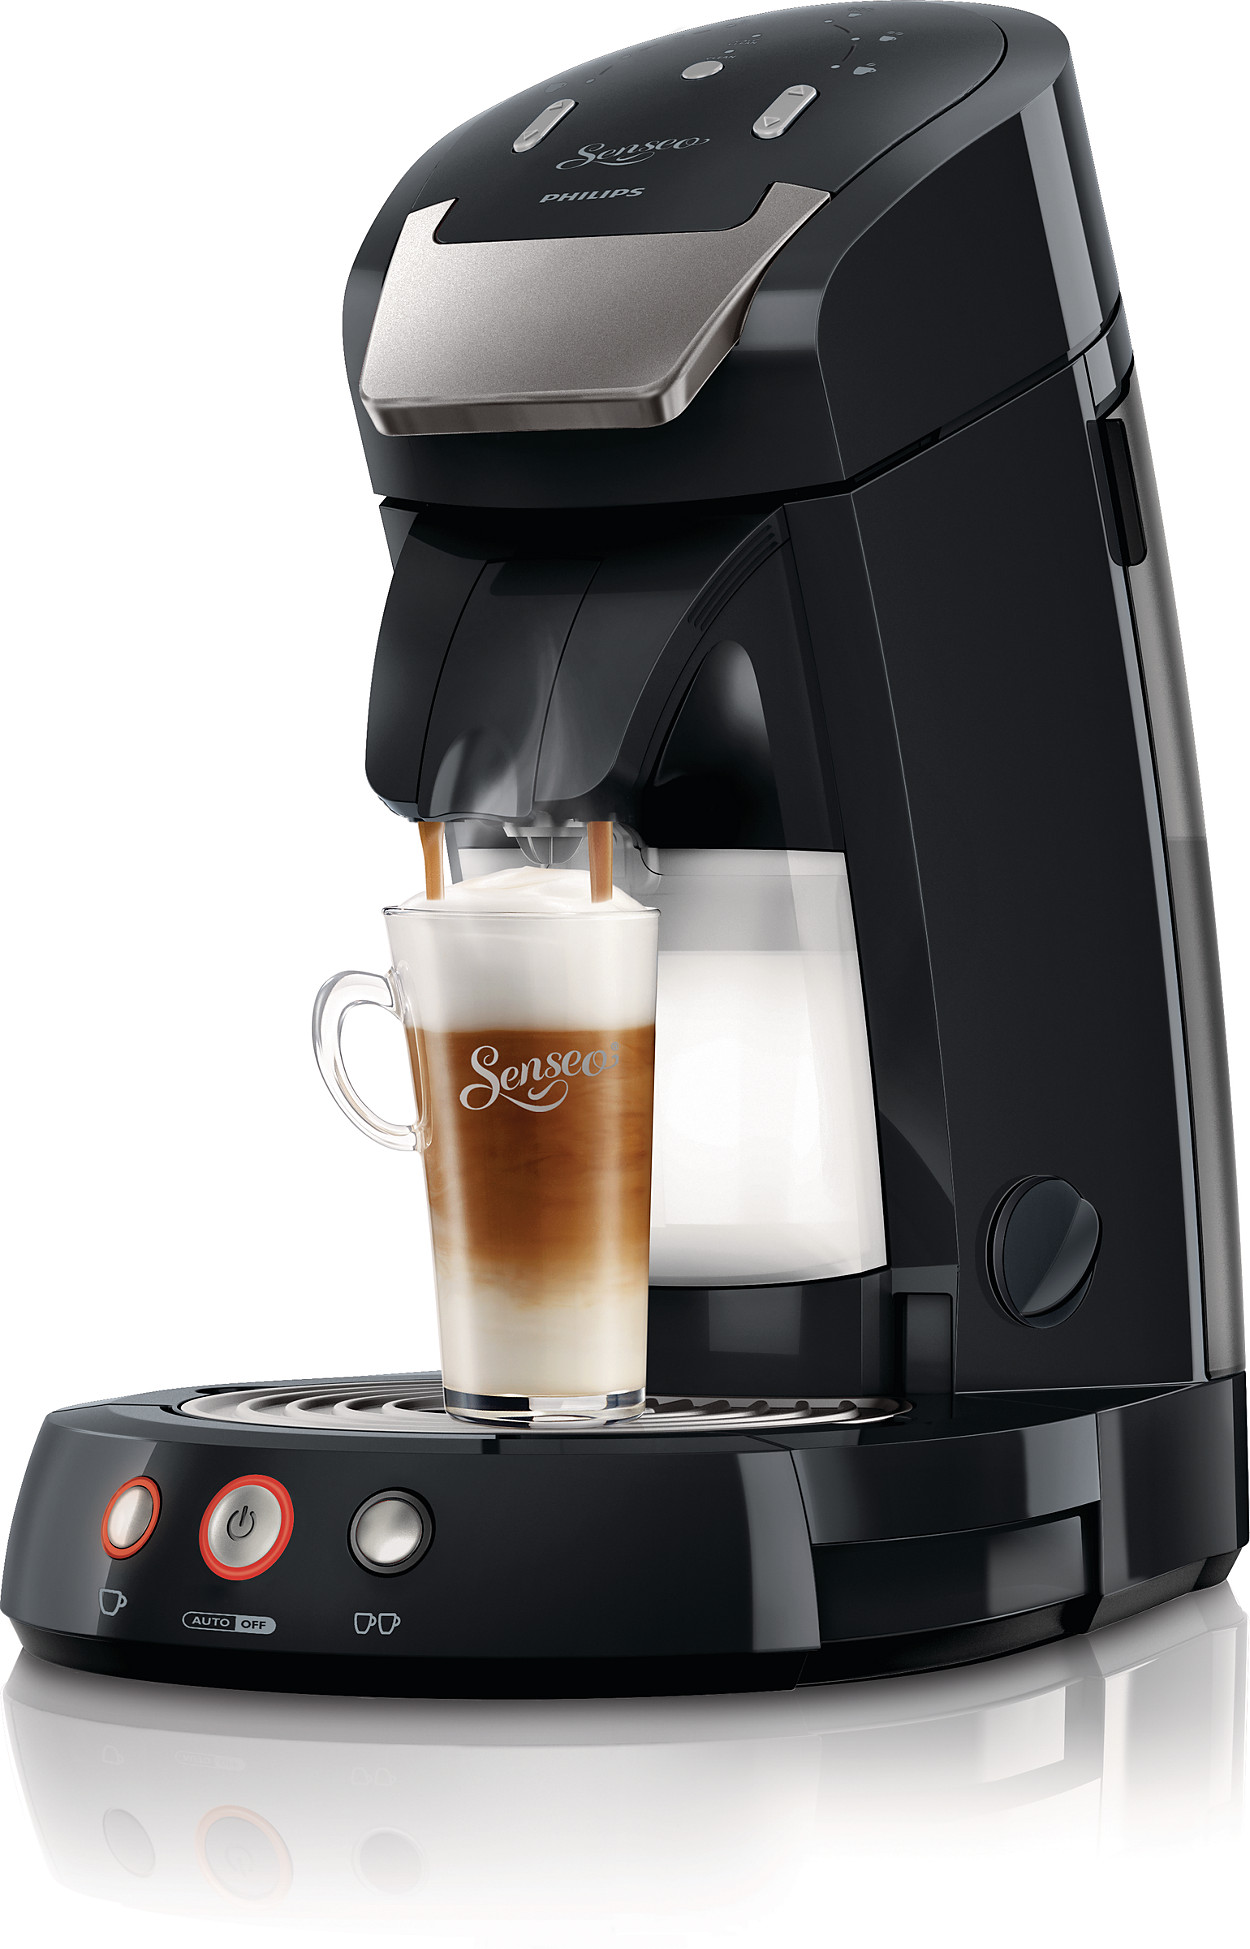 produkt senseo latte select kaffeepadmaschine hd7854 60. Black Bedroom Furniture Sets. Home Design Ideas